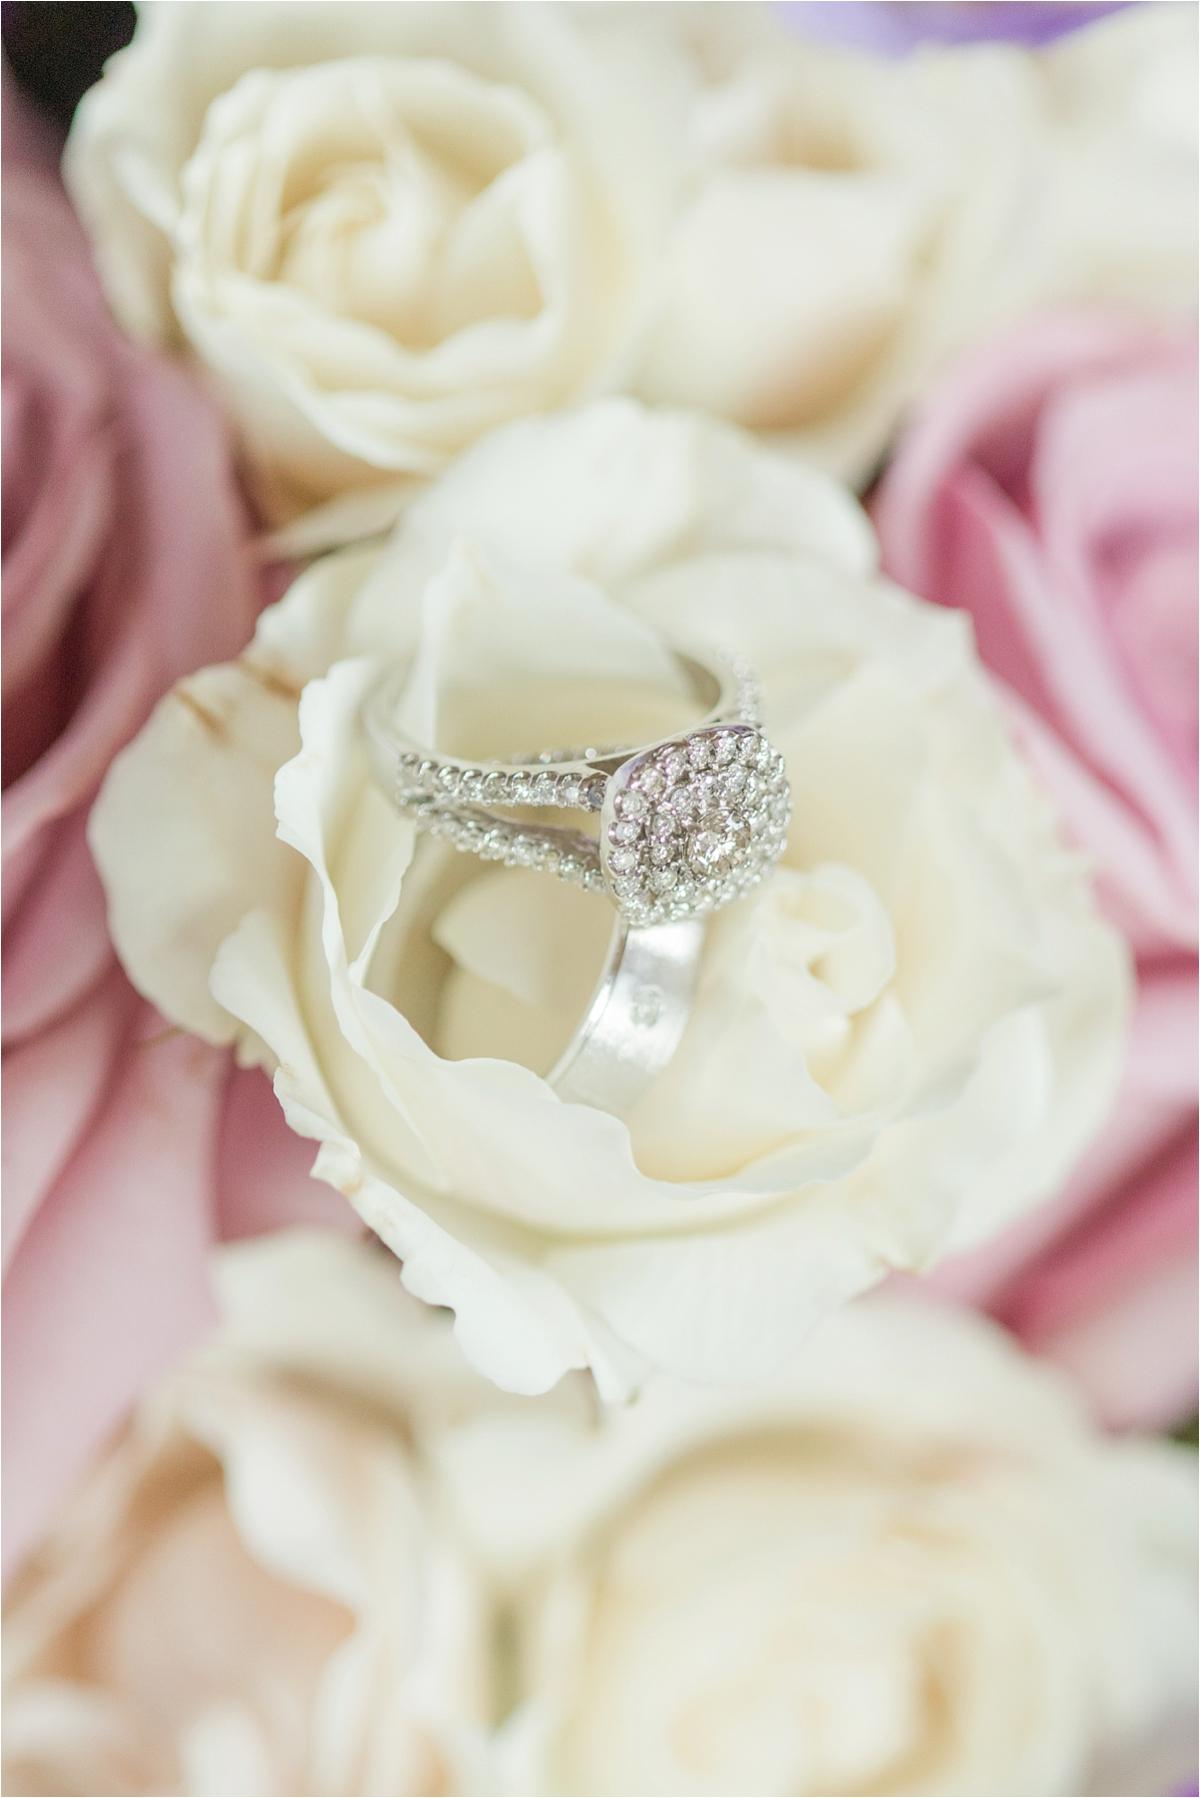 white-gold-engagement-ring-infinity-diamonds-double-halo-band